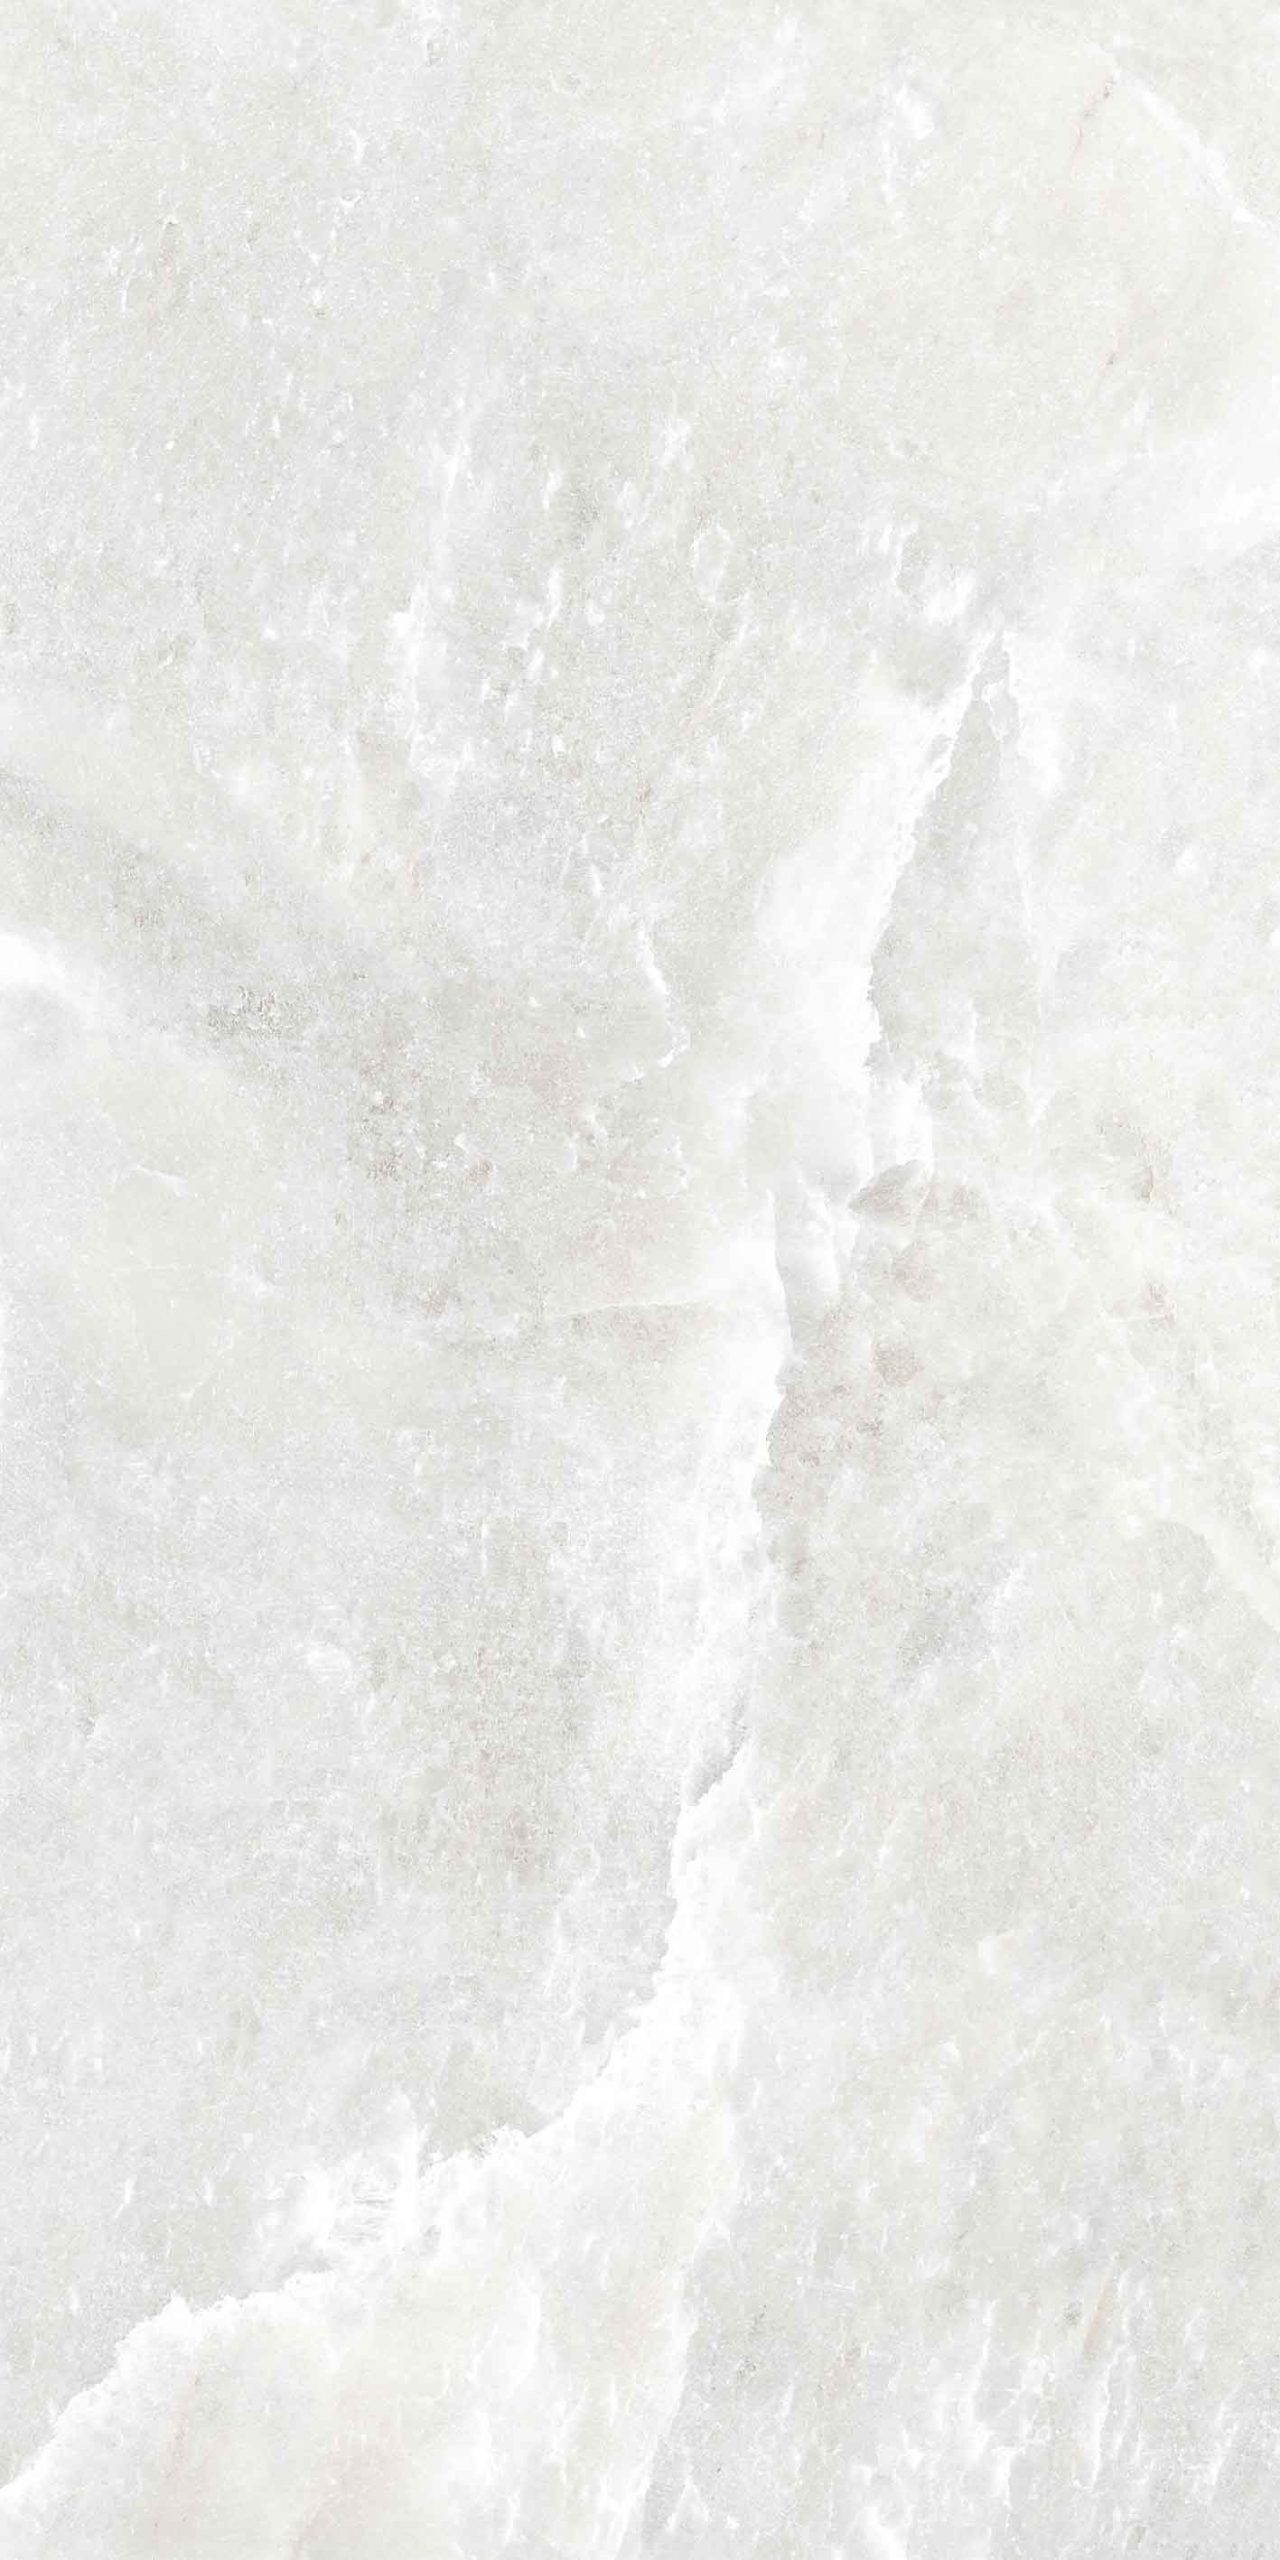 Rock Salt of Cerim White Gold Glossy 6mm 120 x 240